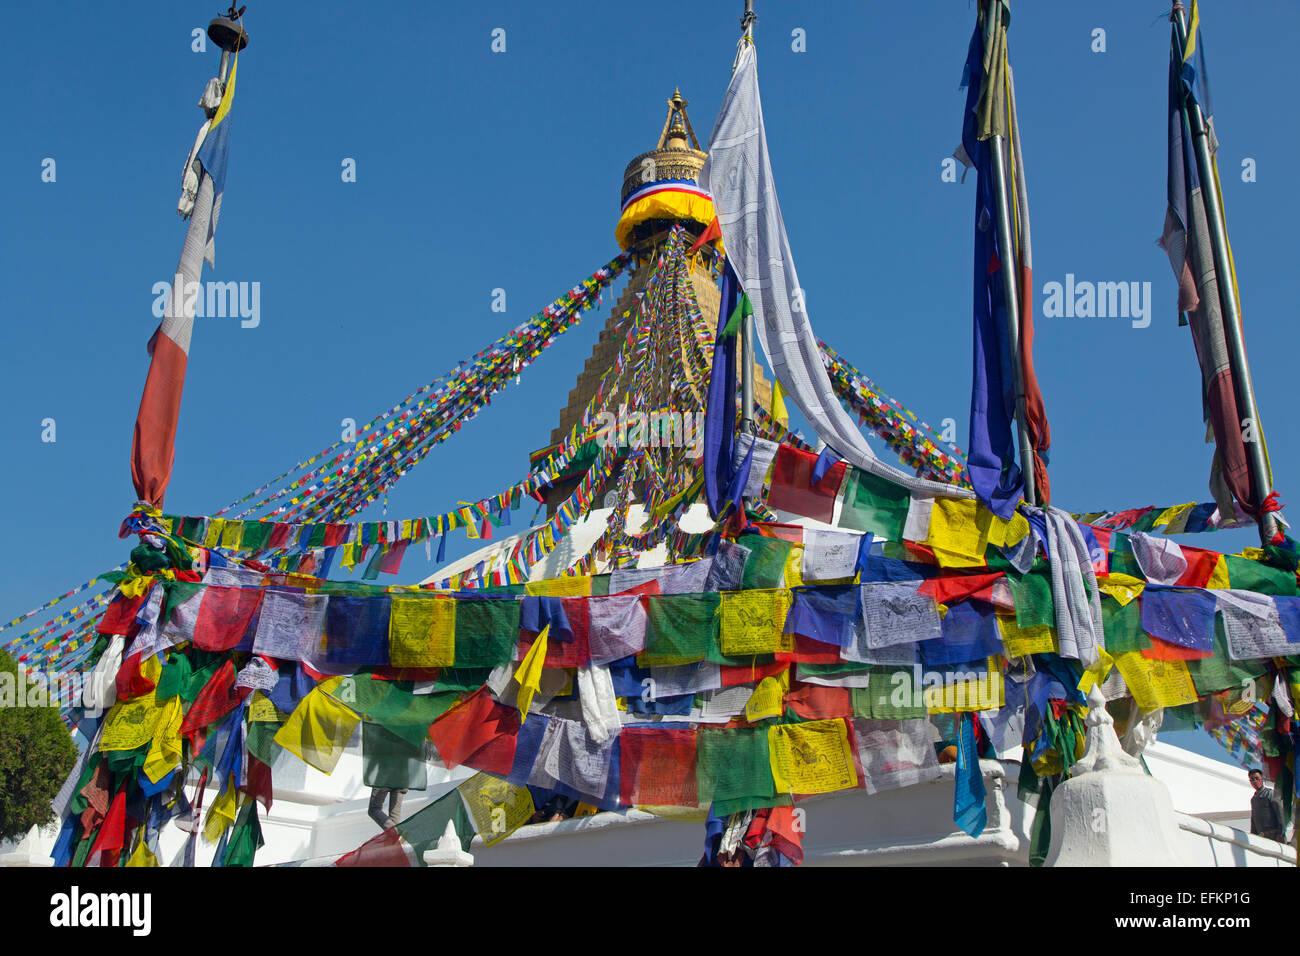 Bodnath is the largest stupa in Nepal Durbar Suare Kathmandu - Stock Image